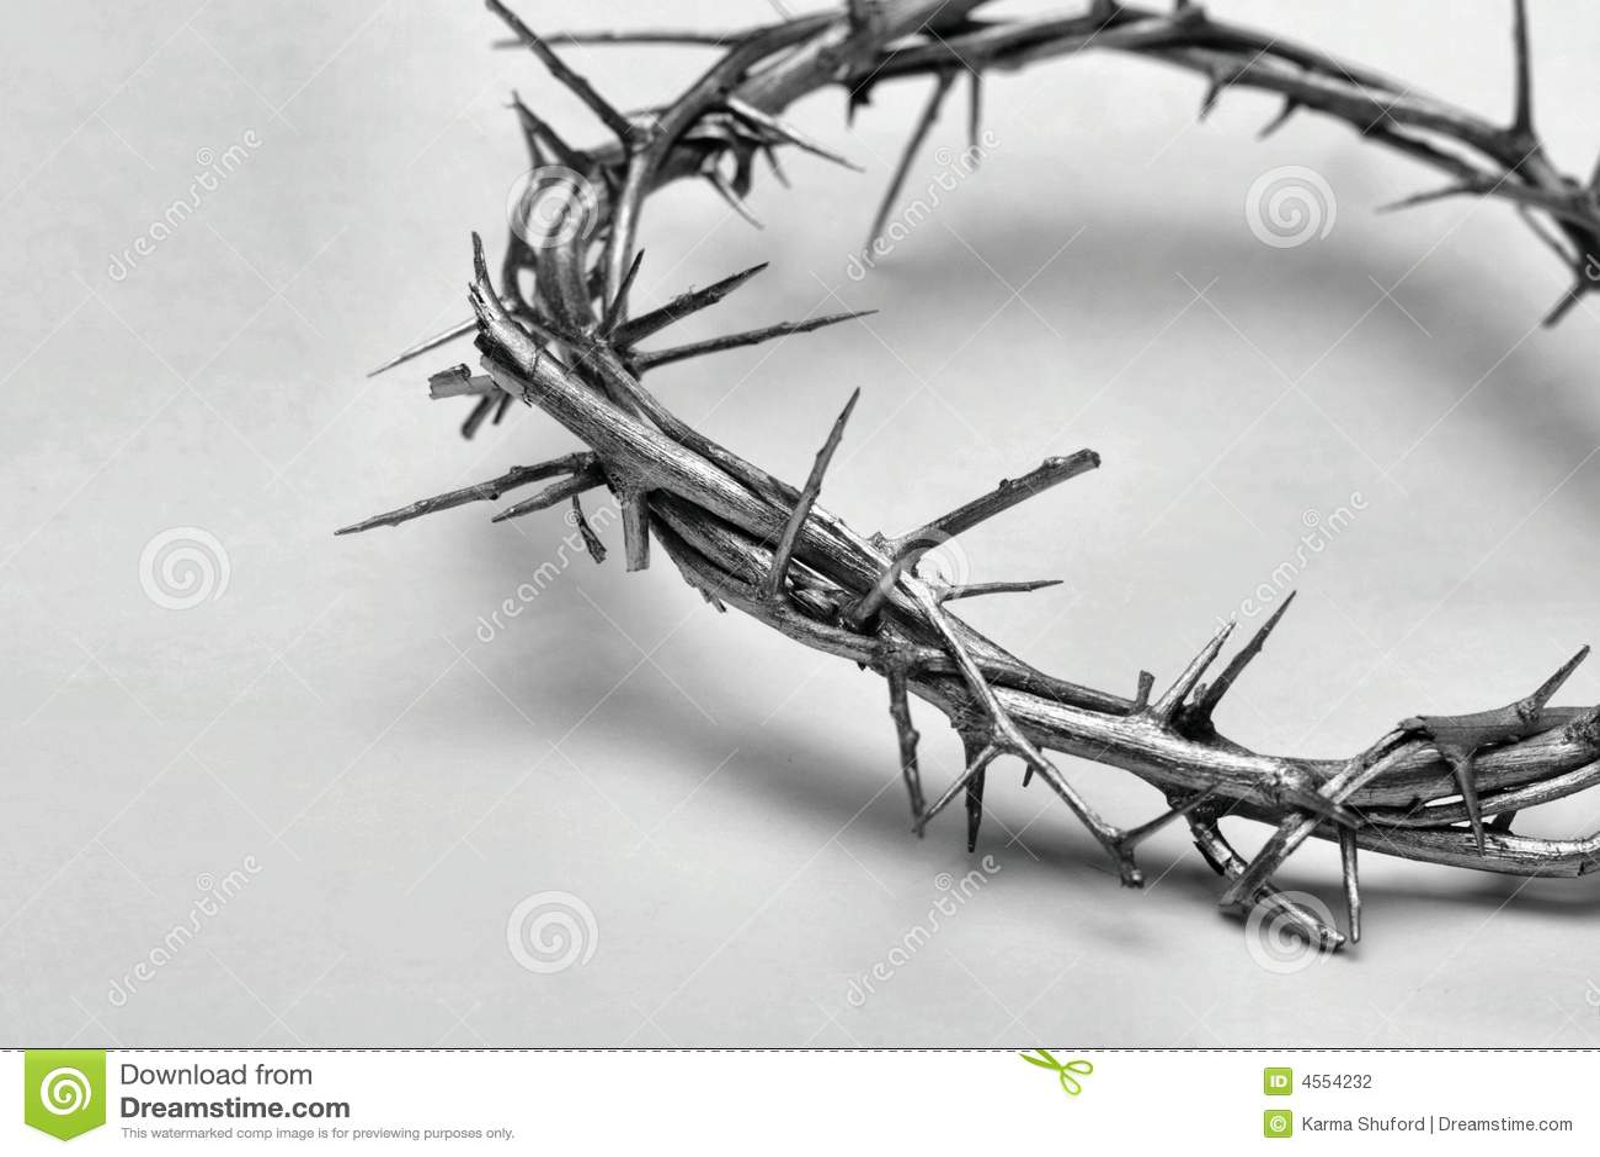 jesus christ crucifixion black white stock photos images